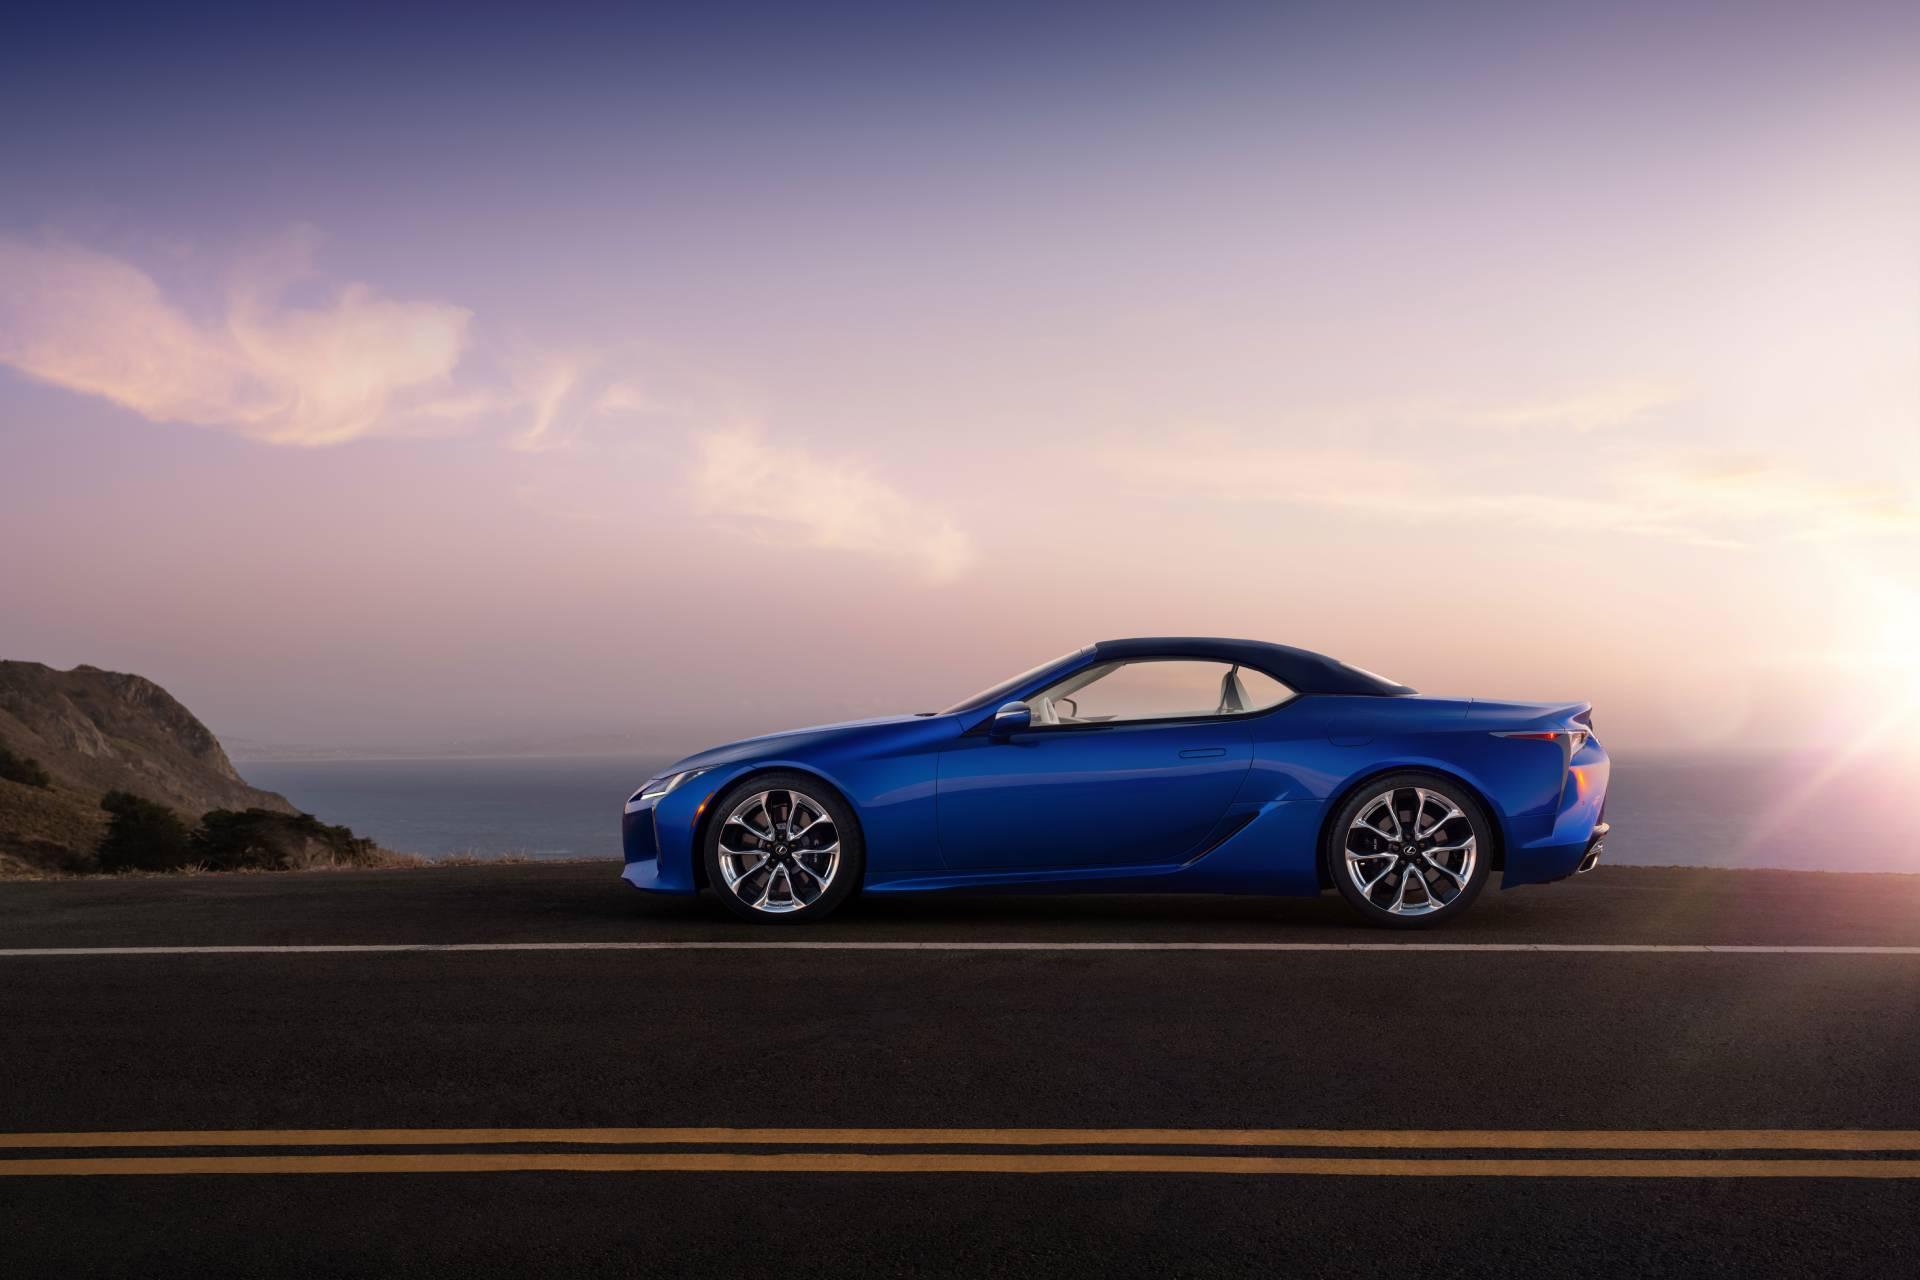 Lexus LC 500 Convertible Inspiration Series. Credit: Lexus USA Newsroom